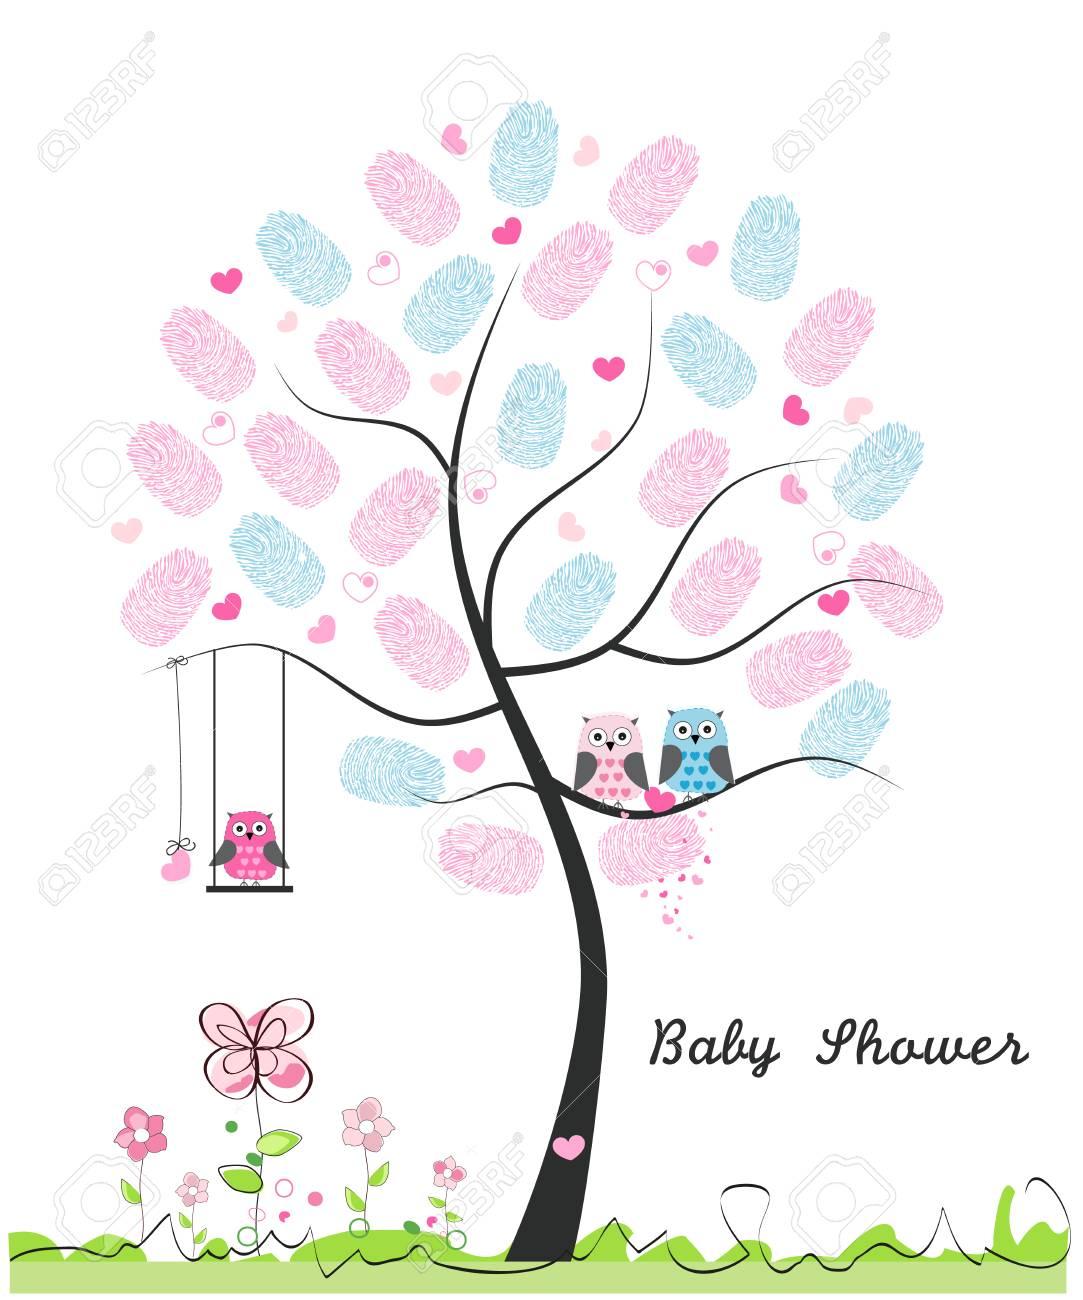 Baby Shower Greeting Card Images : shower, greeting, images, Shower, Greeting, Card., Family, Royalty, Cliparts,, Vectors,, Stock, Illustration., Image, 112533281.